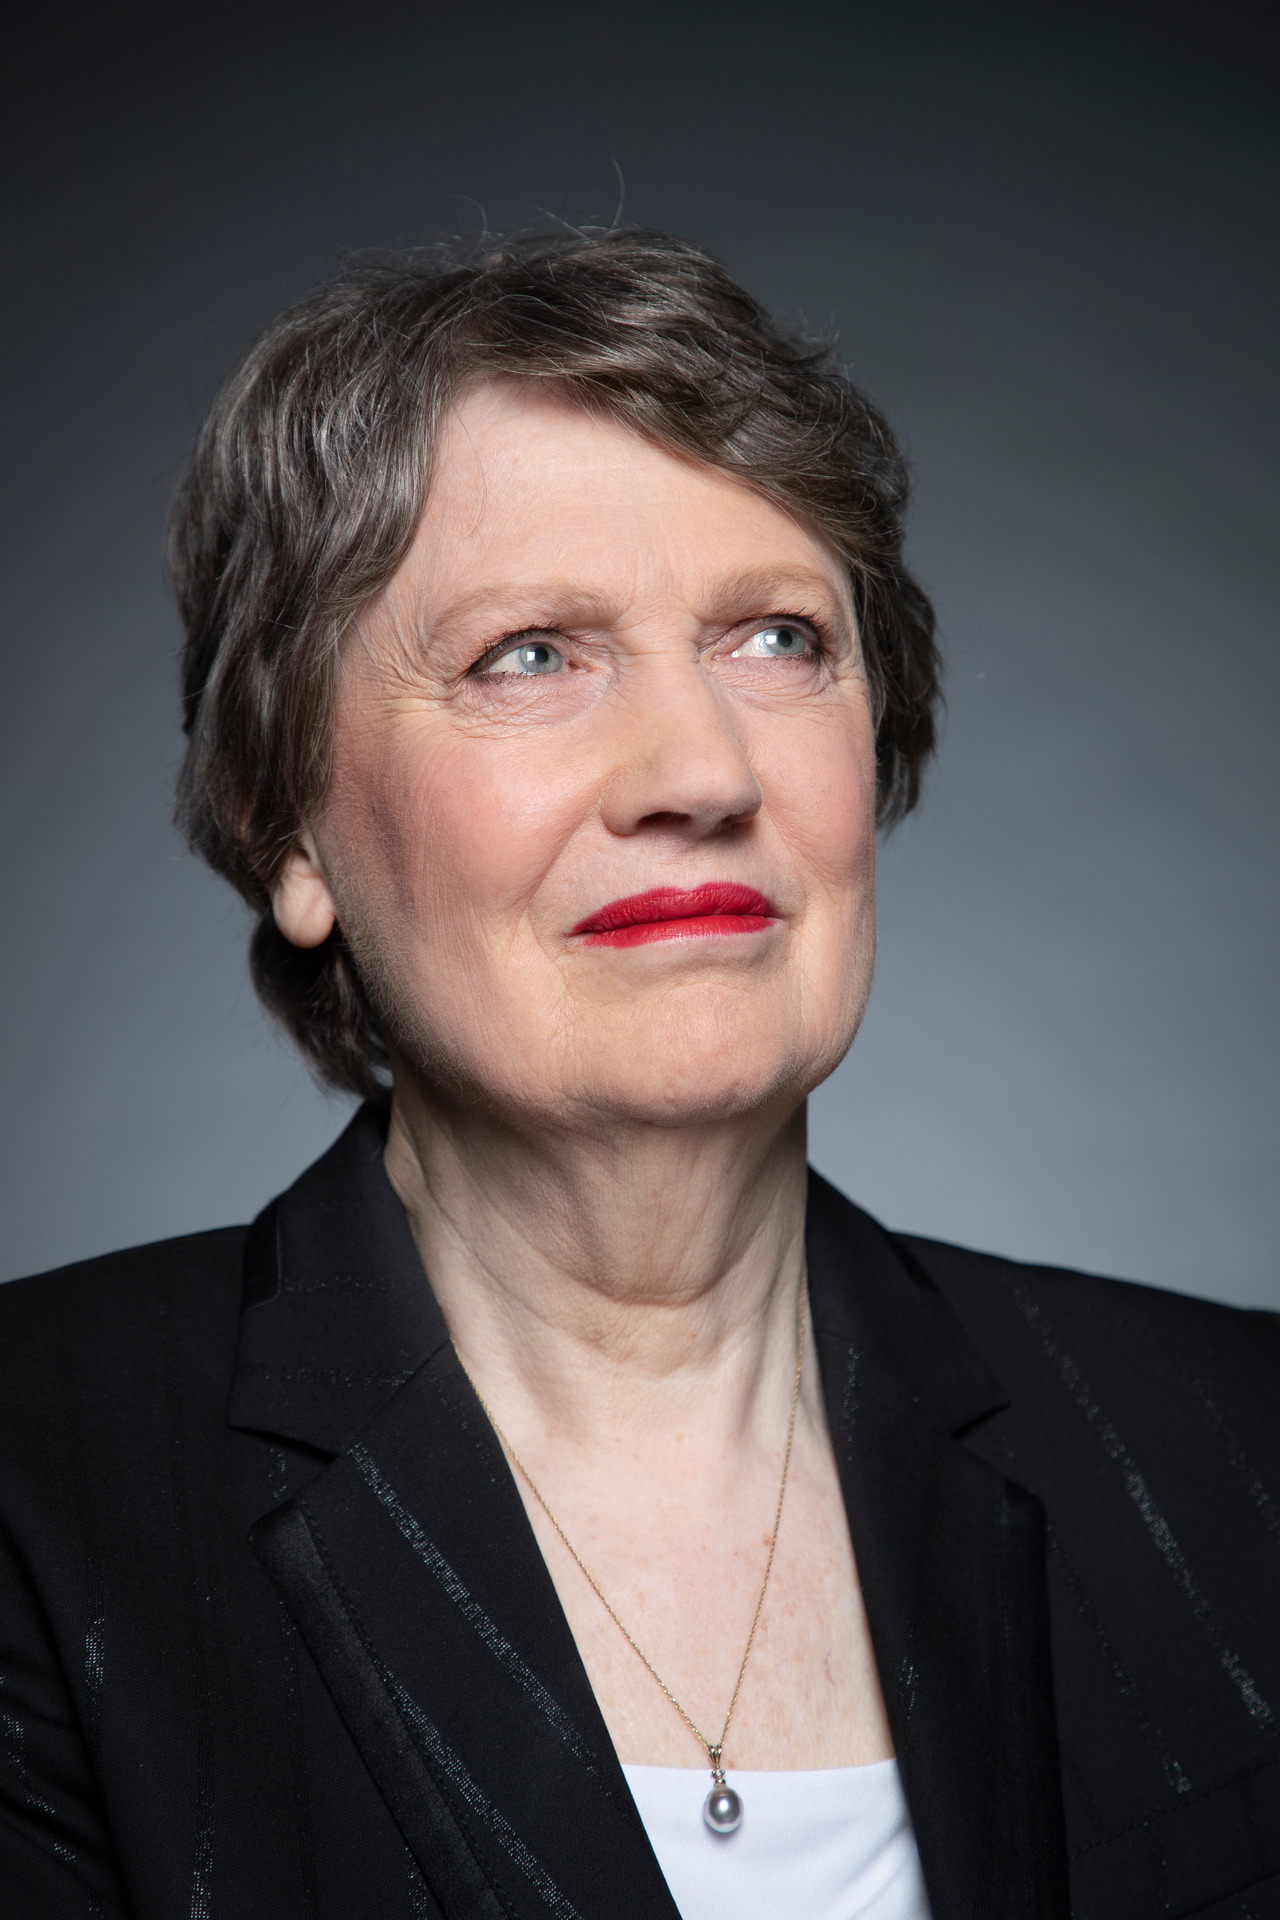 'I can visualise the horror'– Helen Clark on White Island eruption